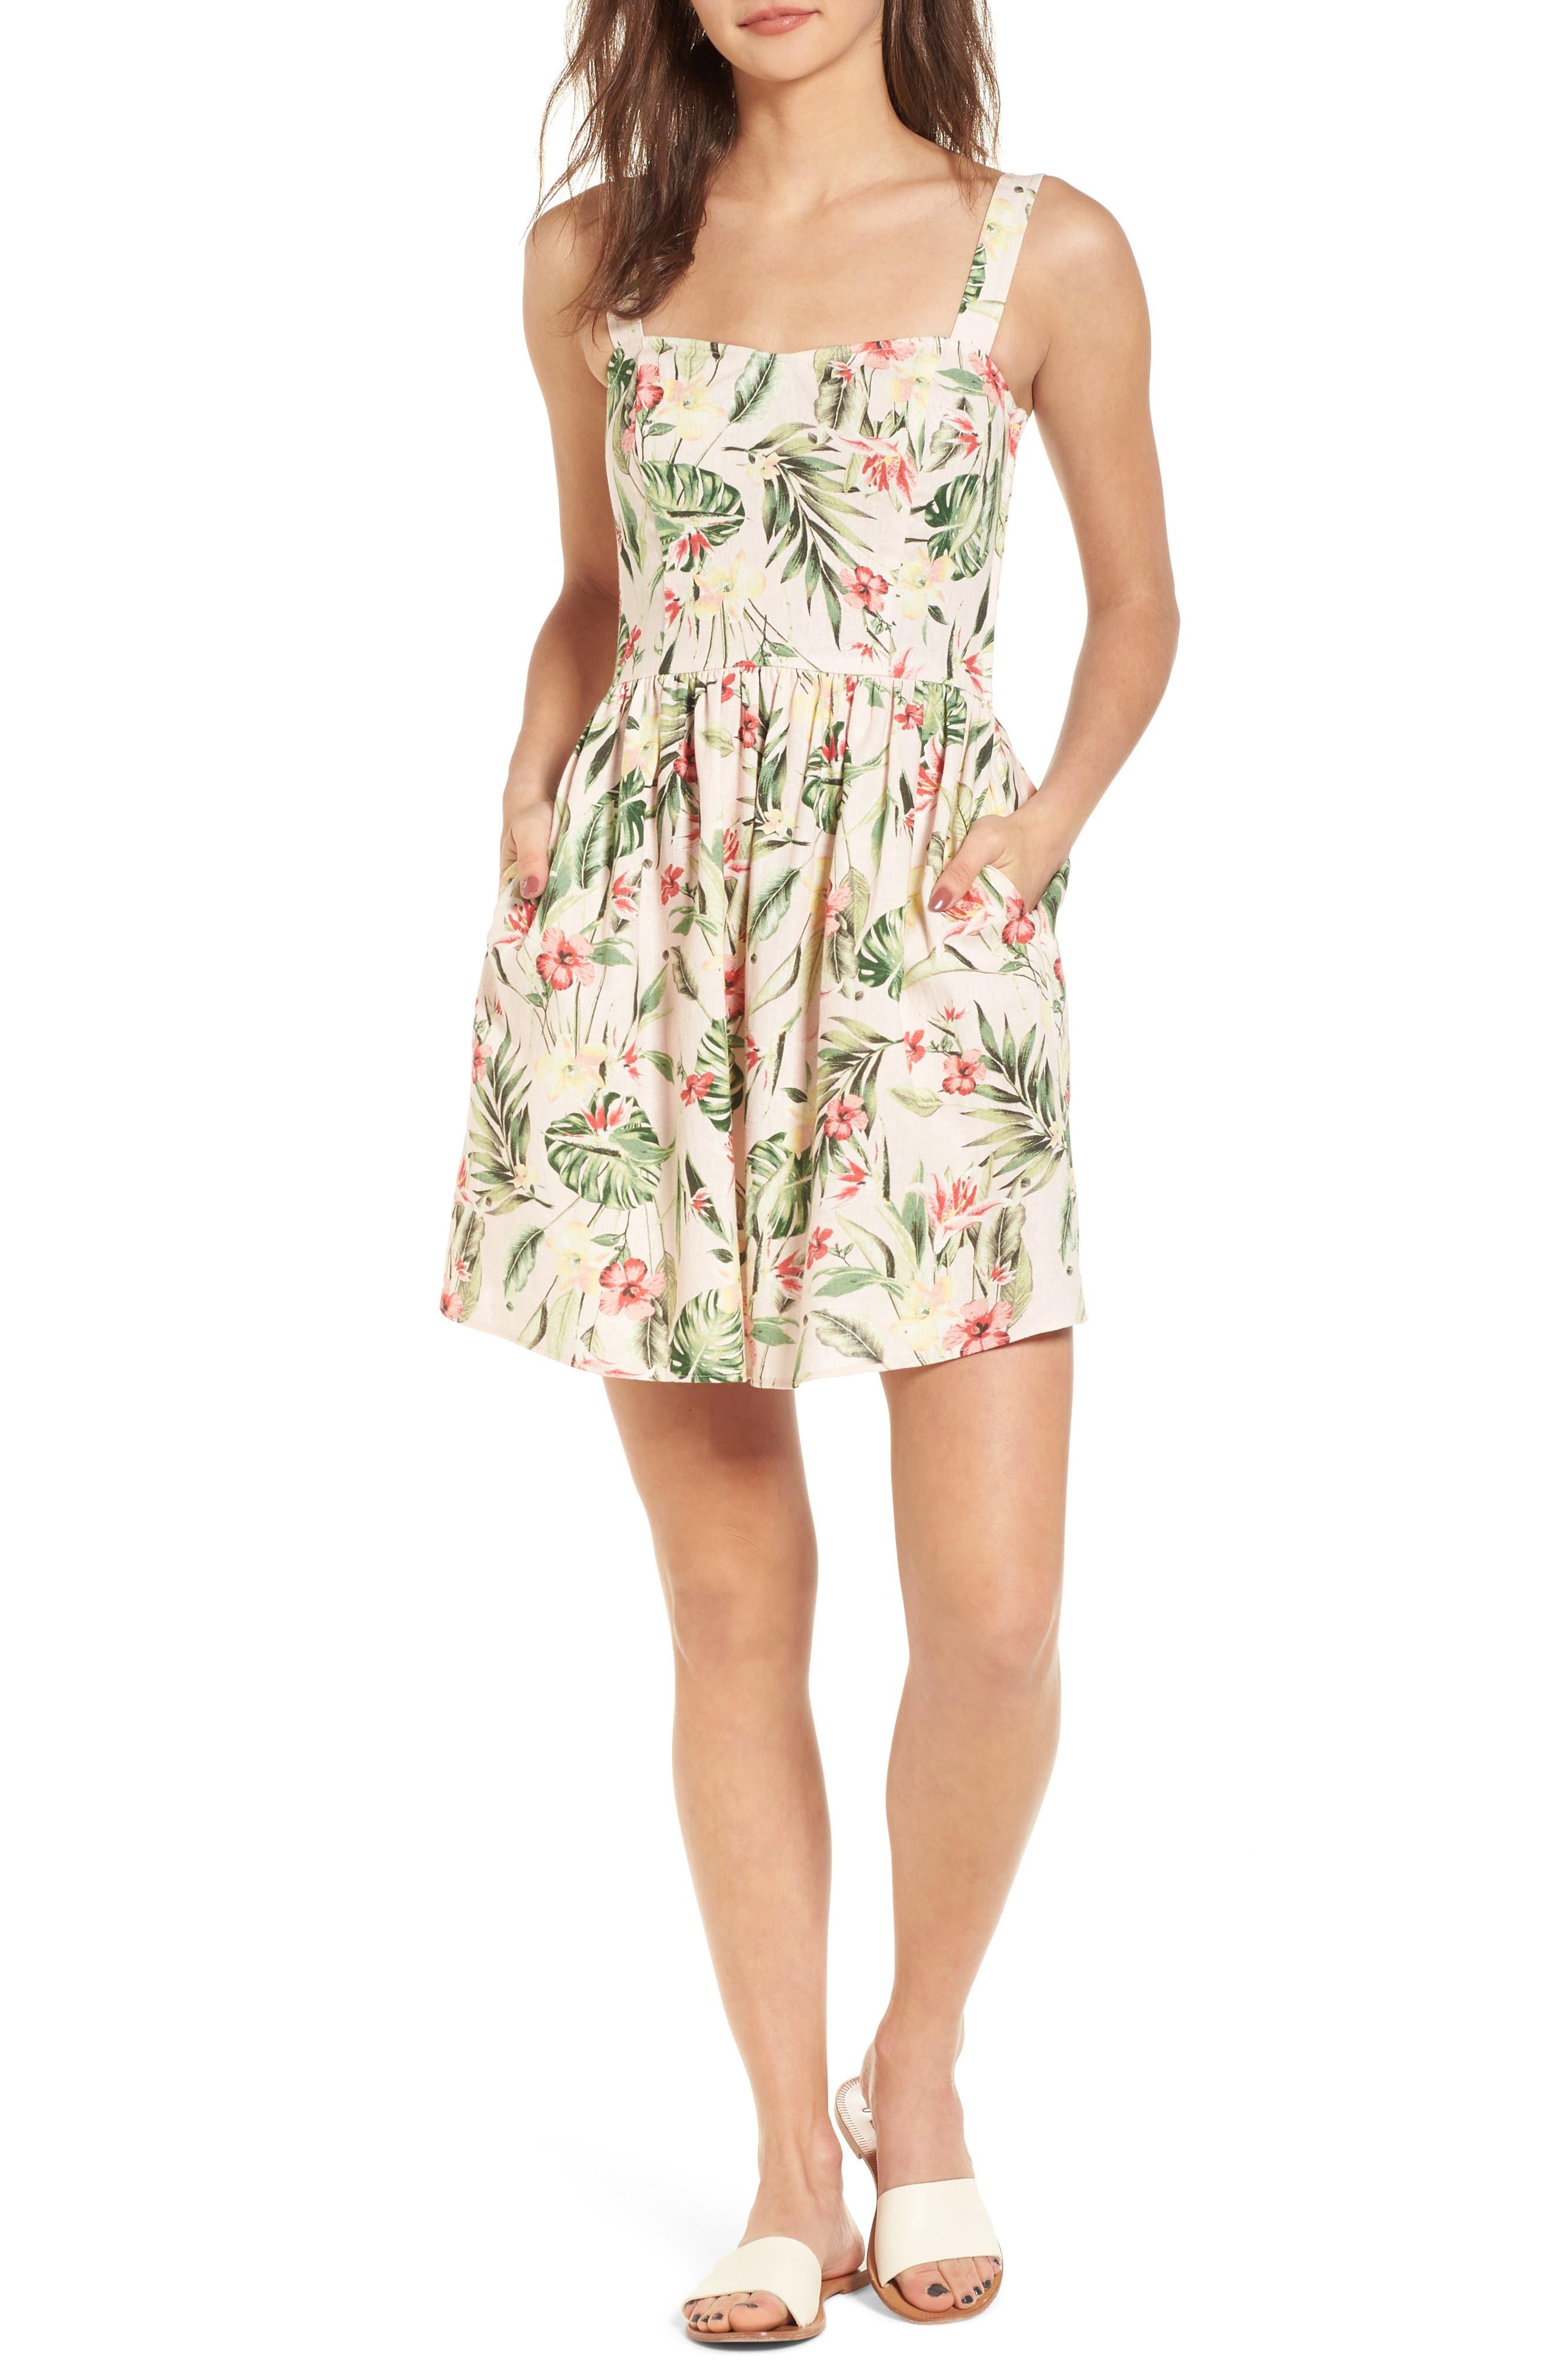 Tropical Lace Back Minidress,                             Main thumbnail 1, color,                             Blush/ Green